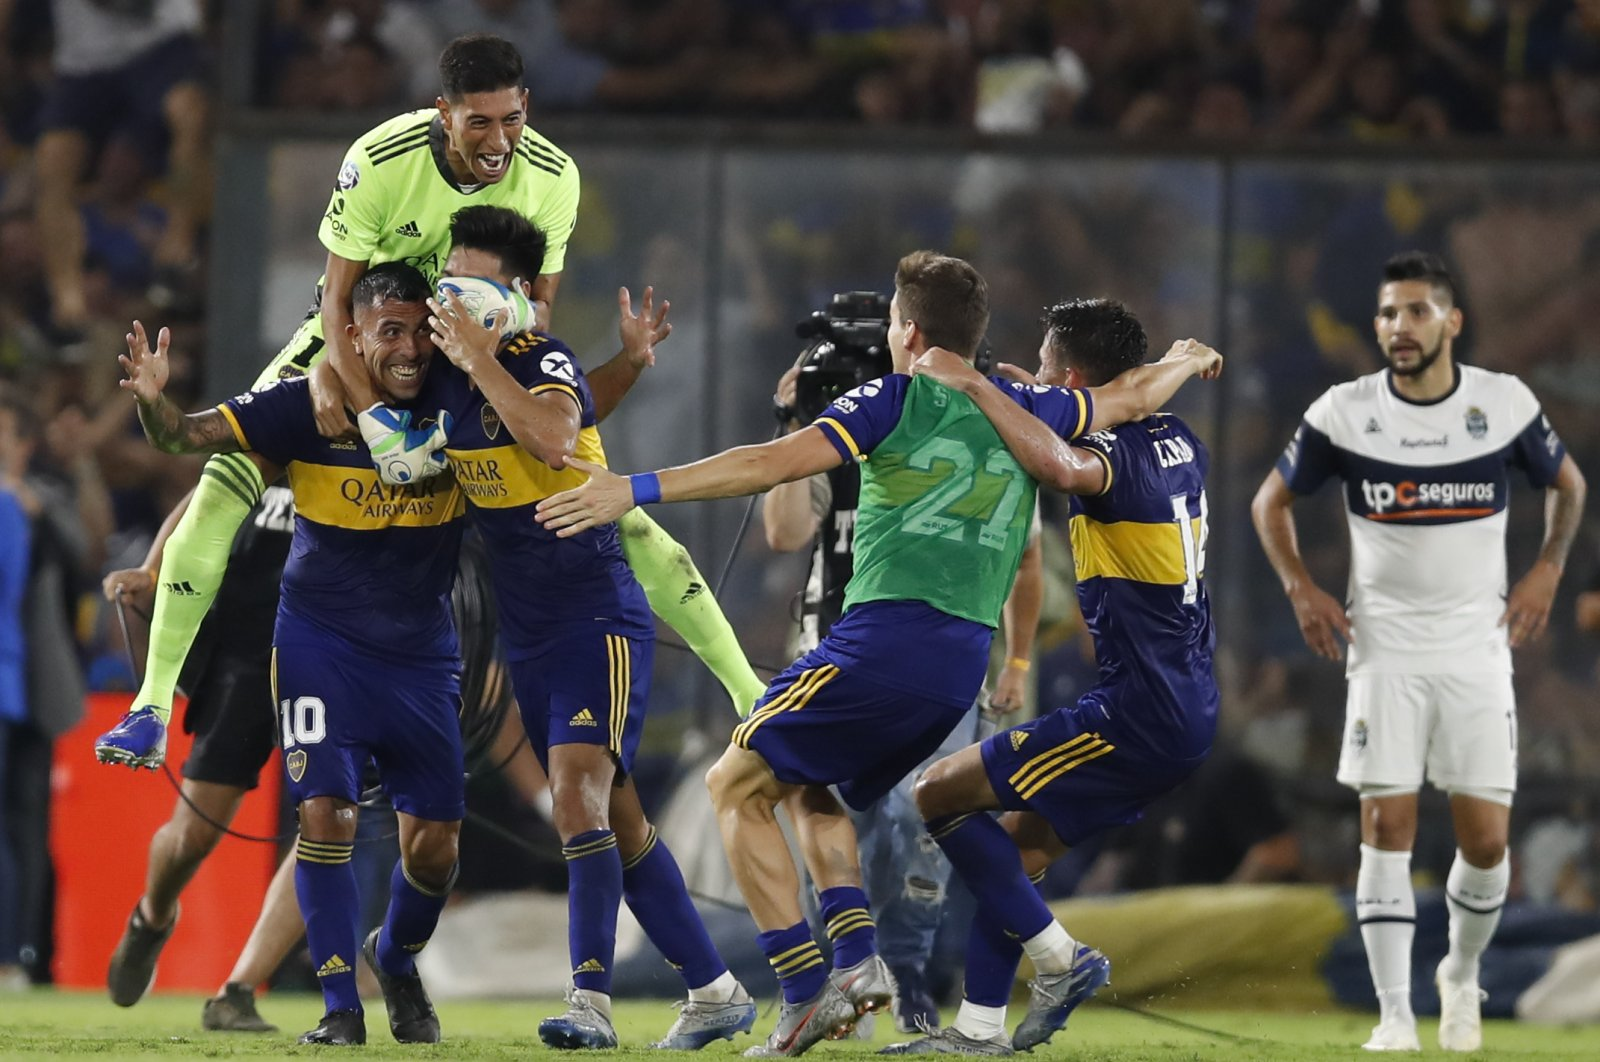 Boca Juniors' Carlos Tevez and his teammates celebrate victory, March 7, 2020. (AP Photo)